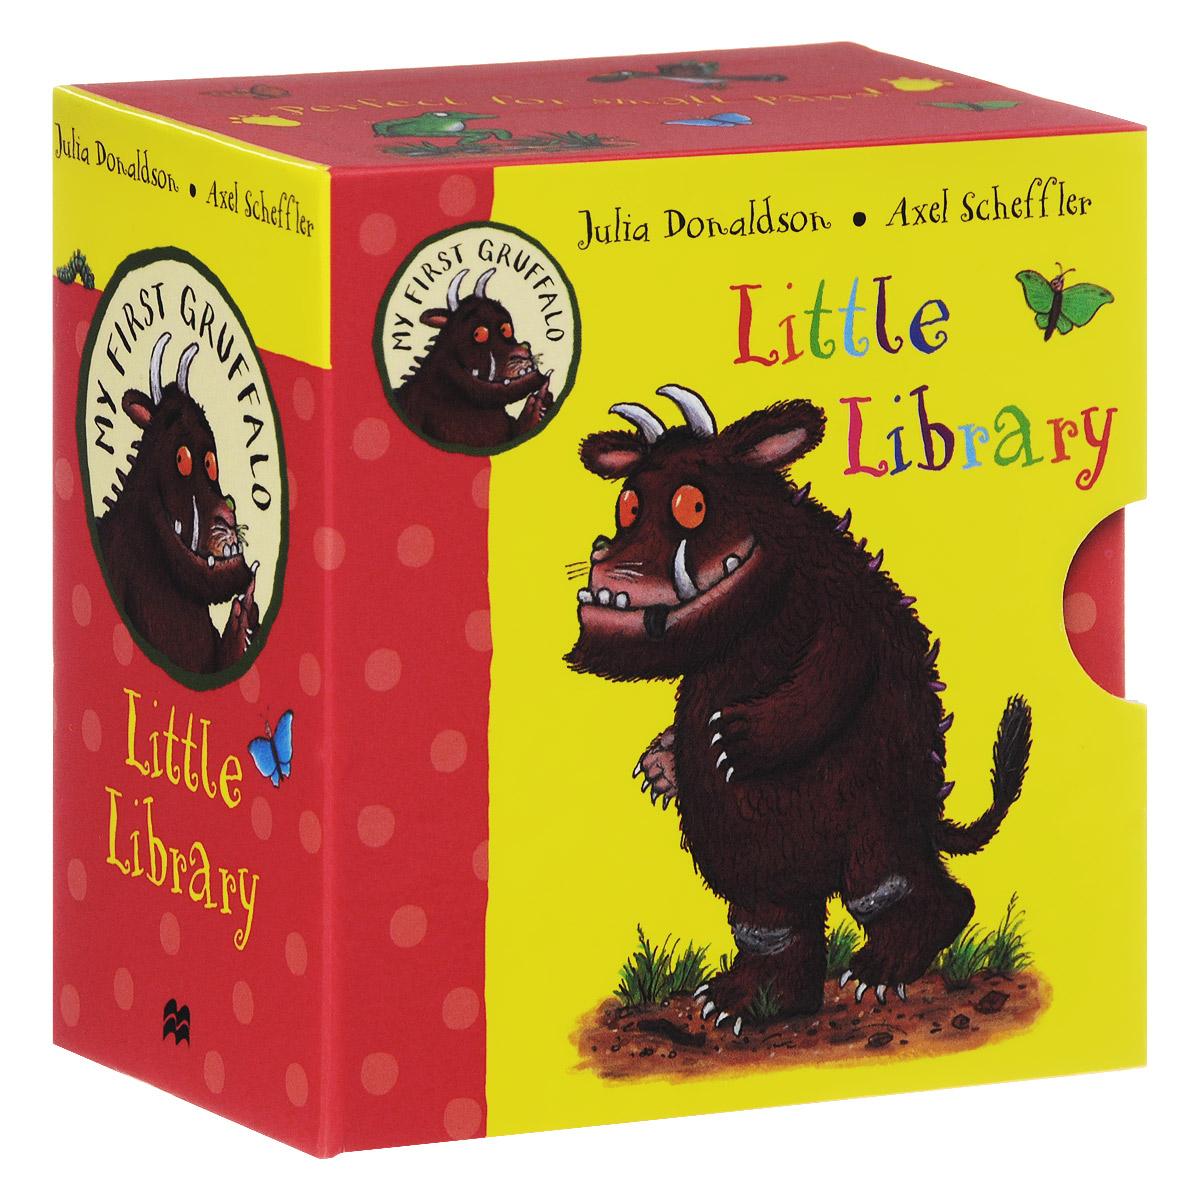 My First Gruffalo Little Library (комплект из 4 миниатюрных книжек)